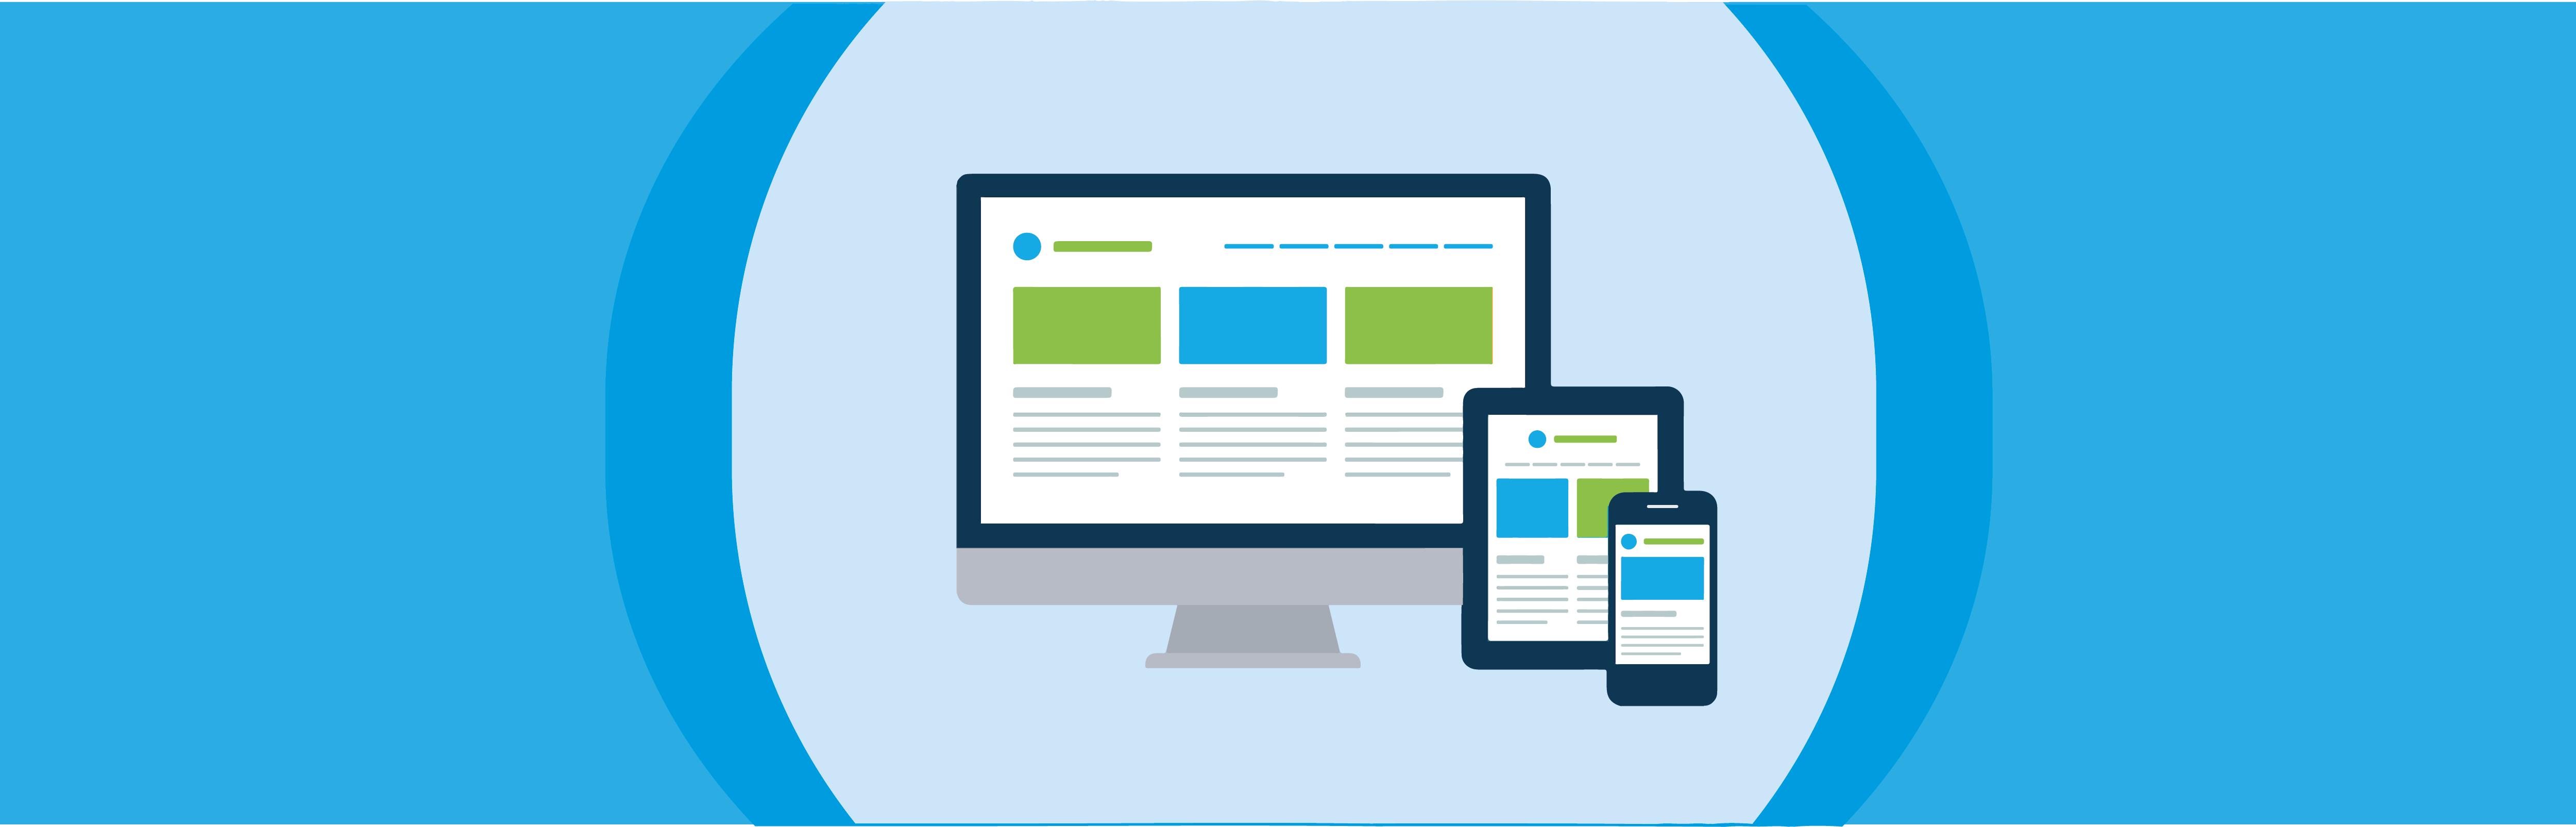 Different Types of websites header